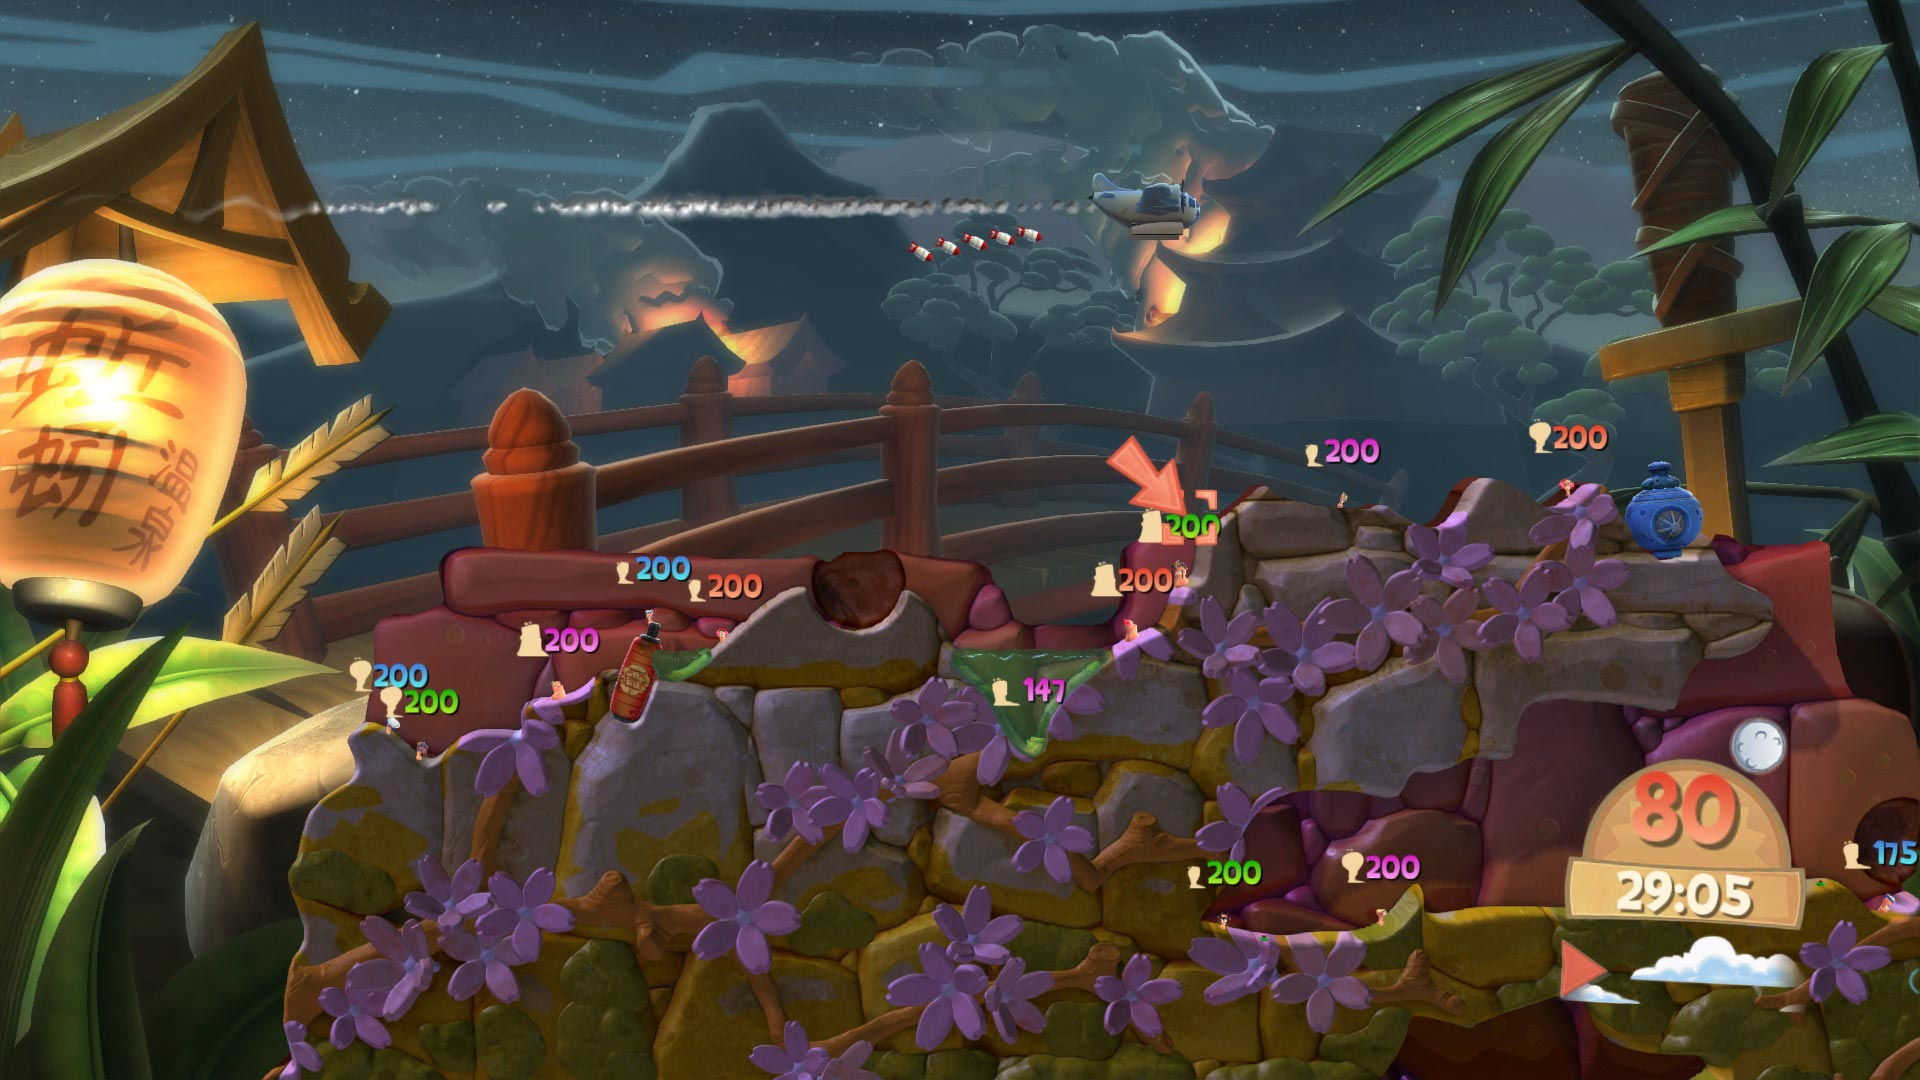 worms u2122 battlegrounds on ps4